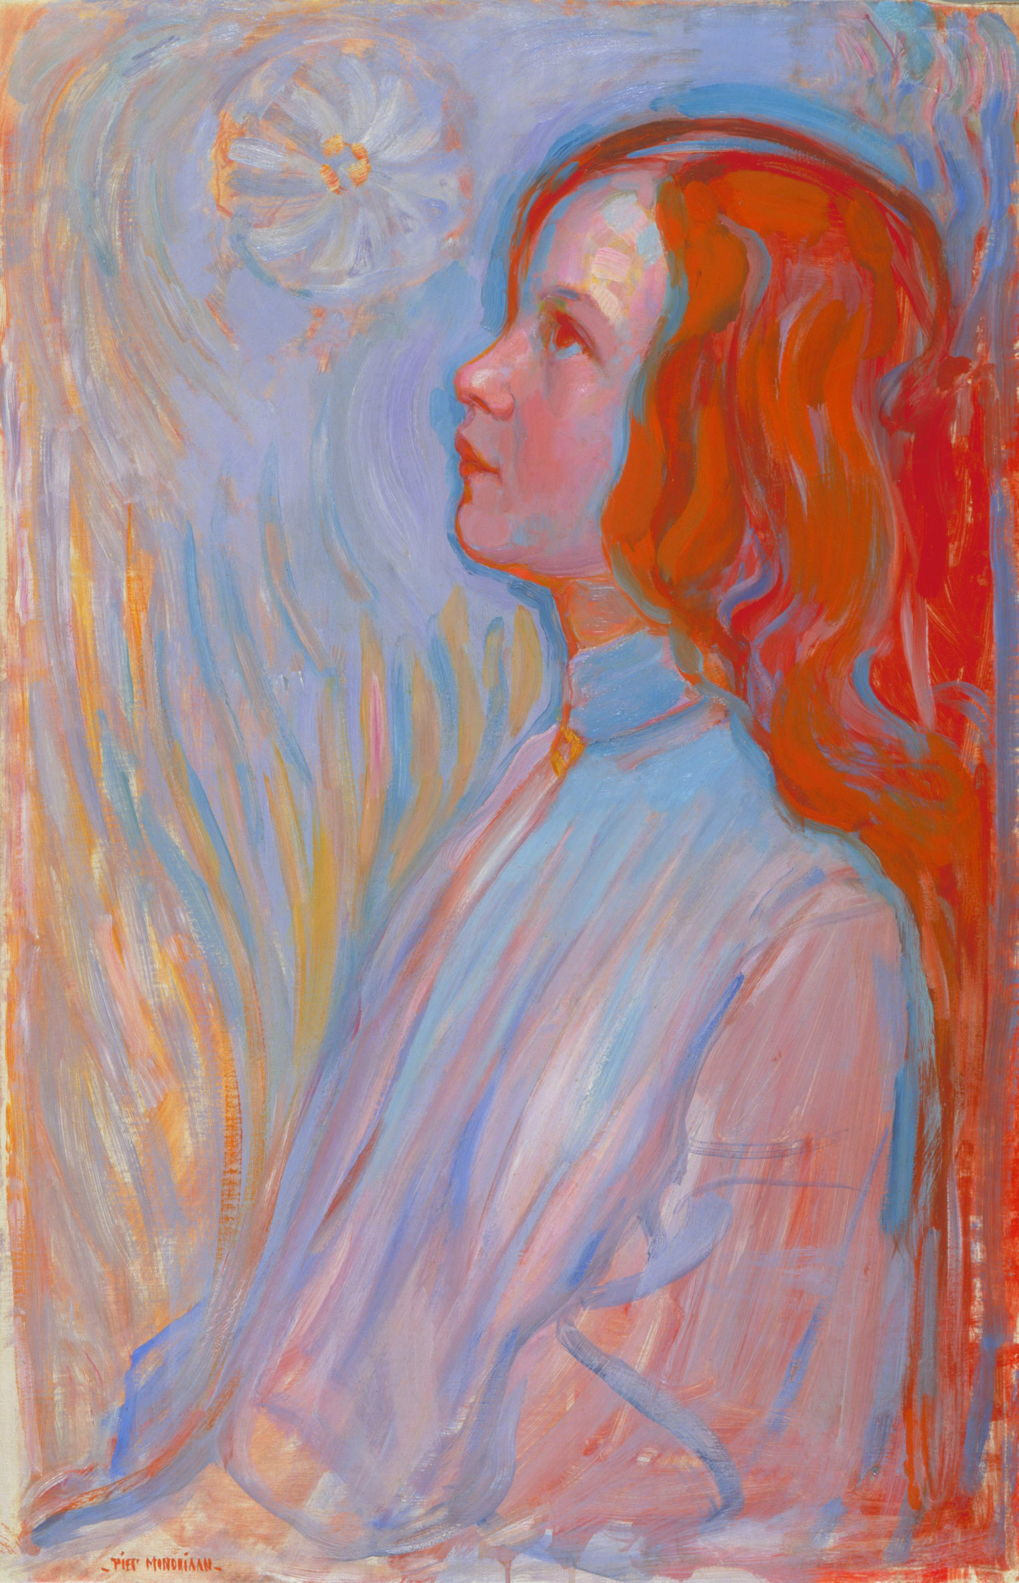 Devotion, by Piet Mondriaan